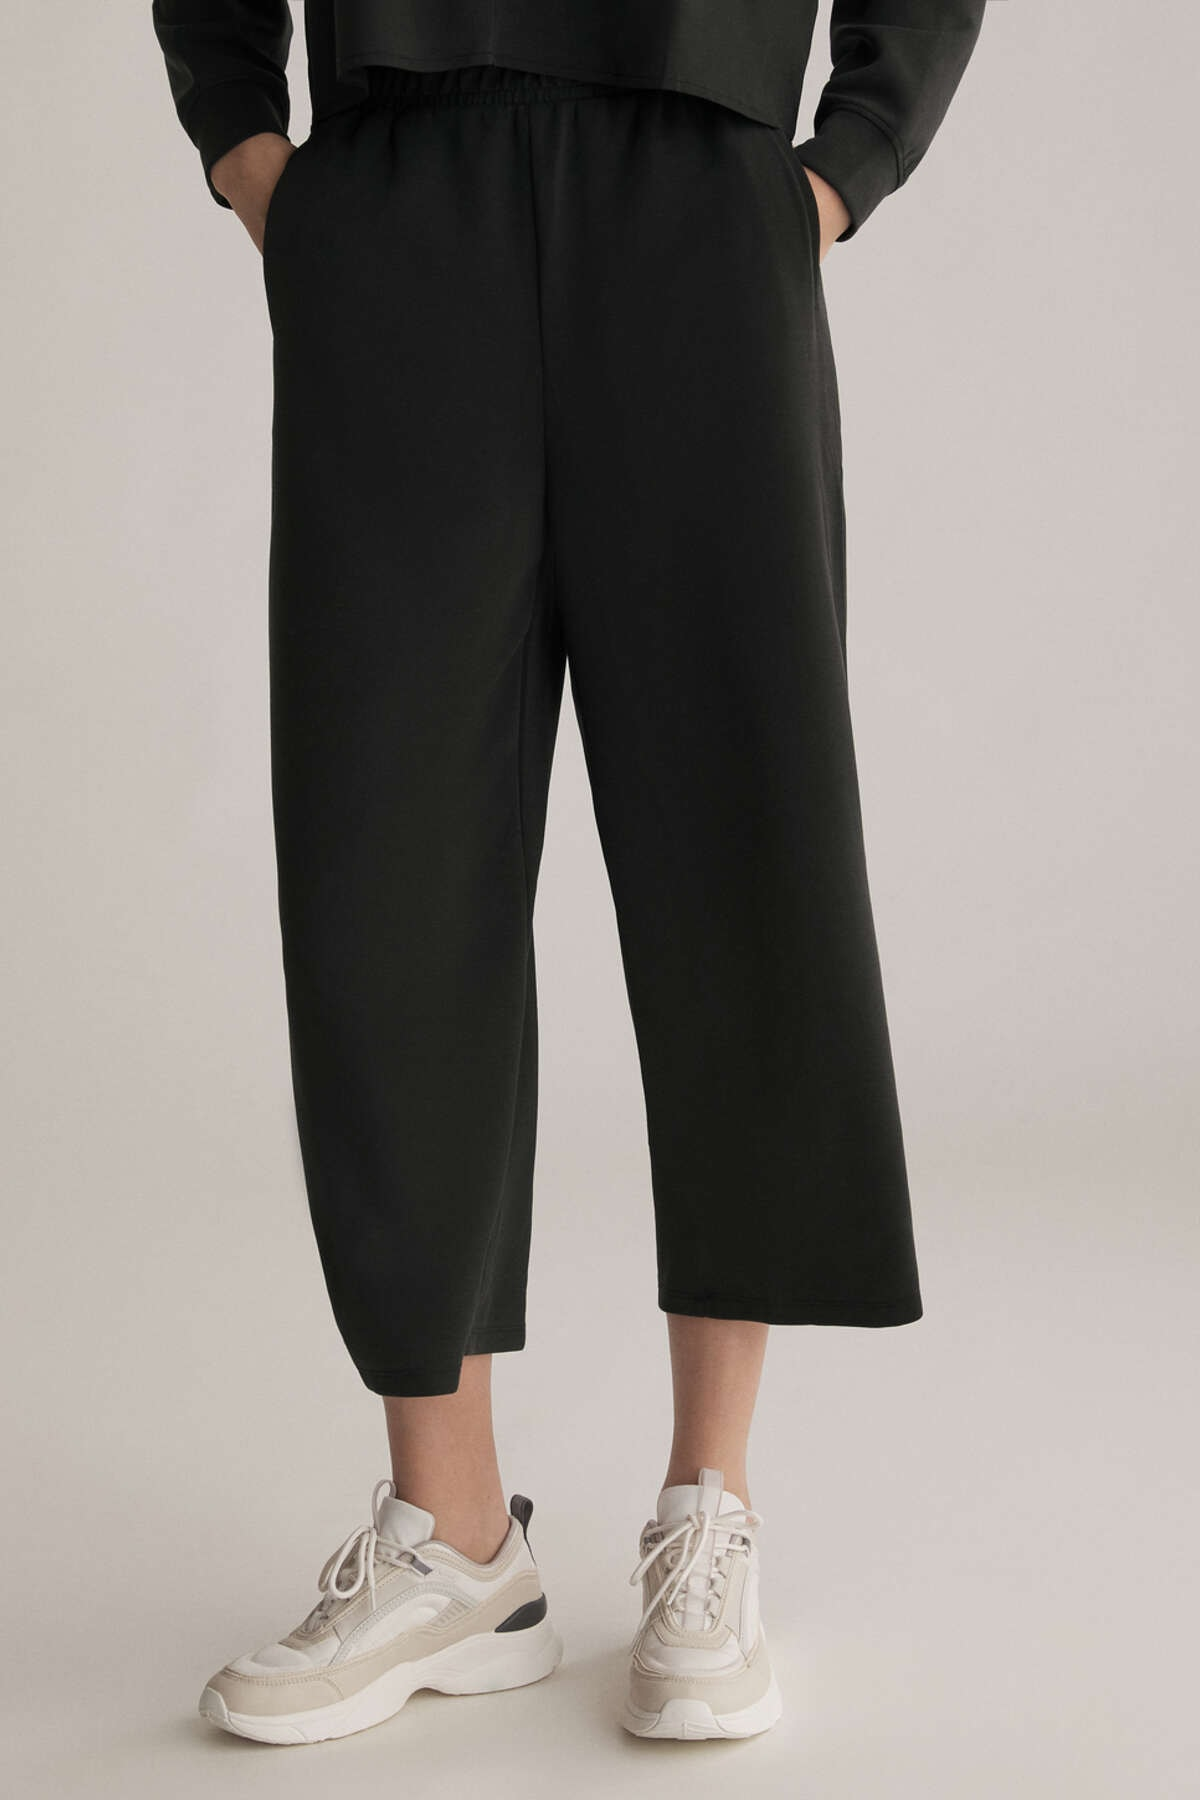 Oysho Kadın Modal Culotte Pantolon Siyah 31237666